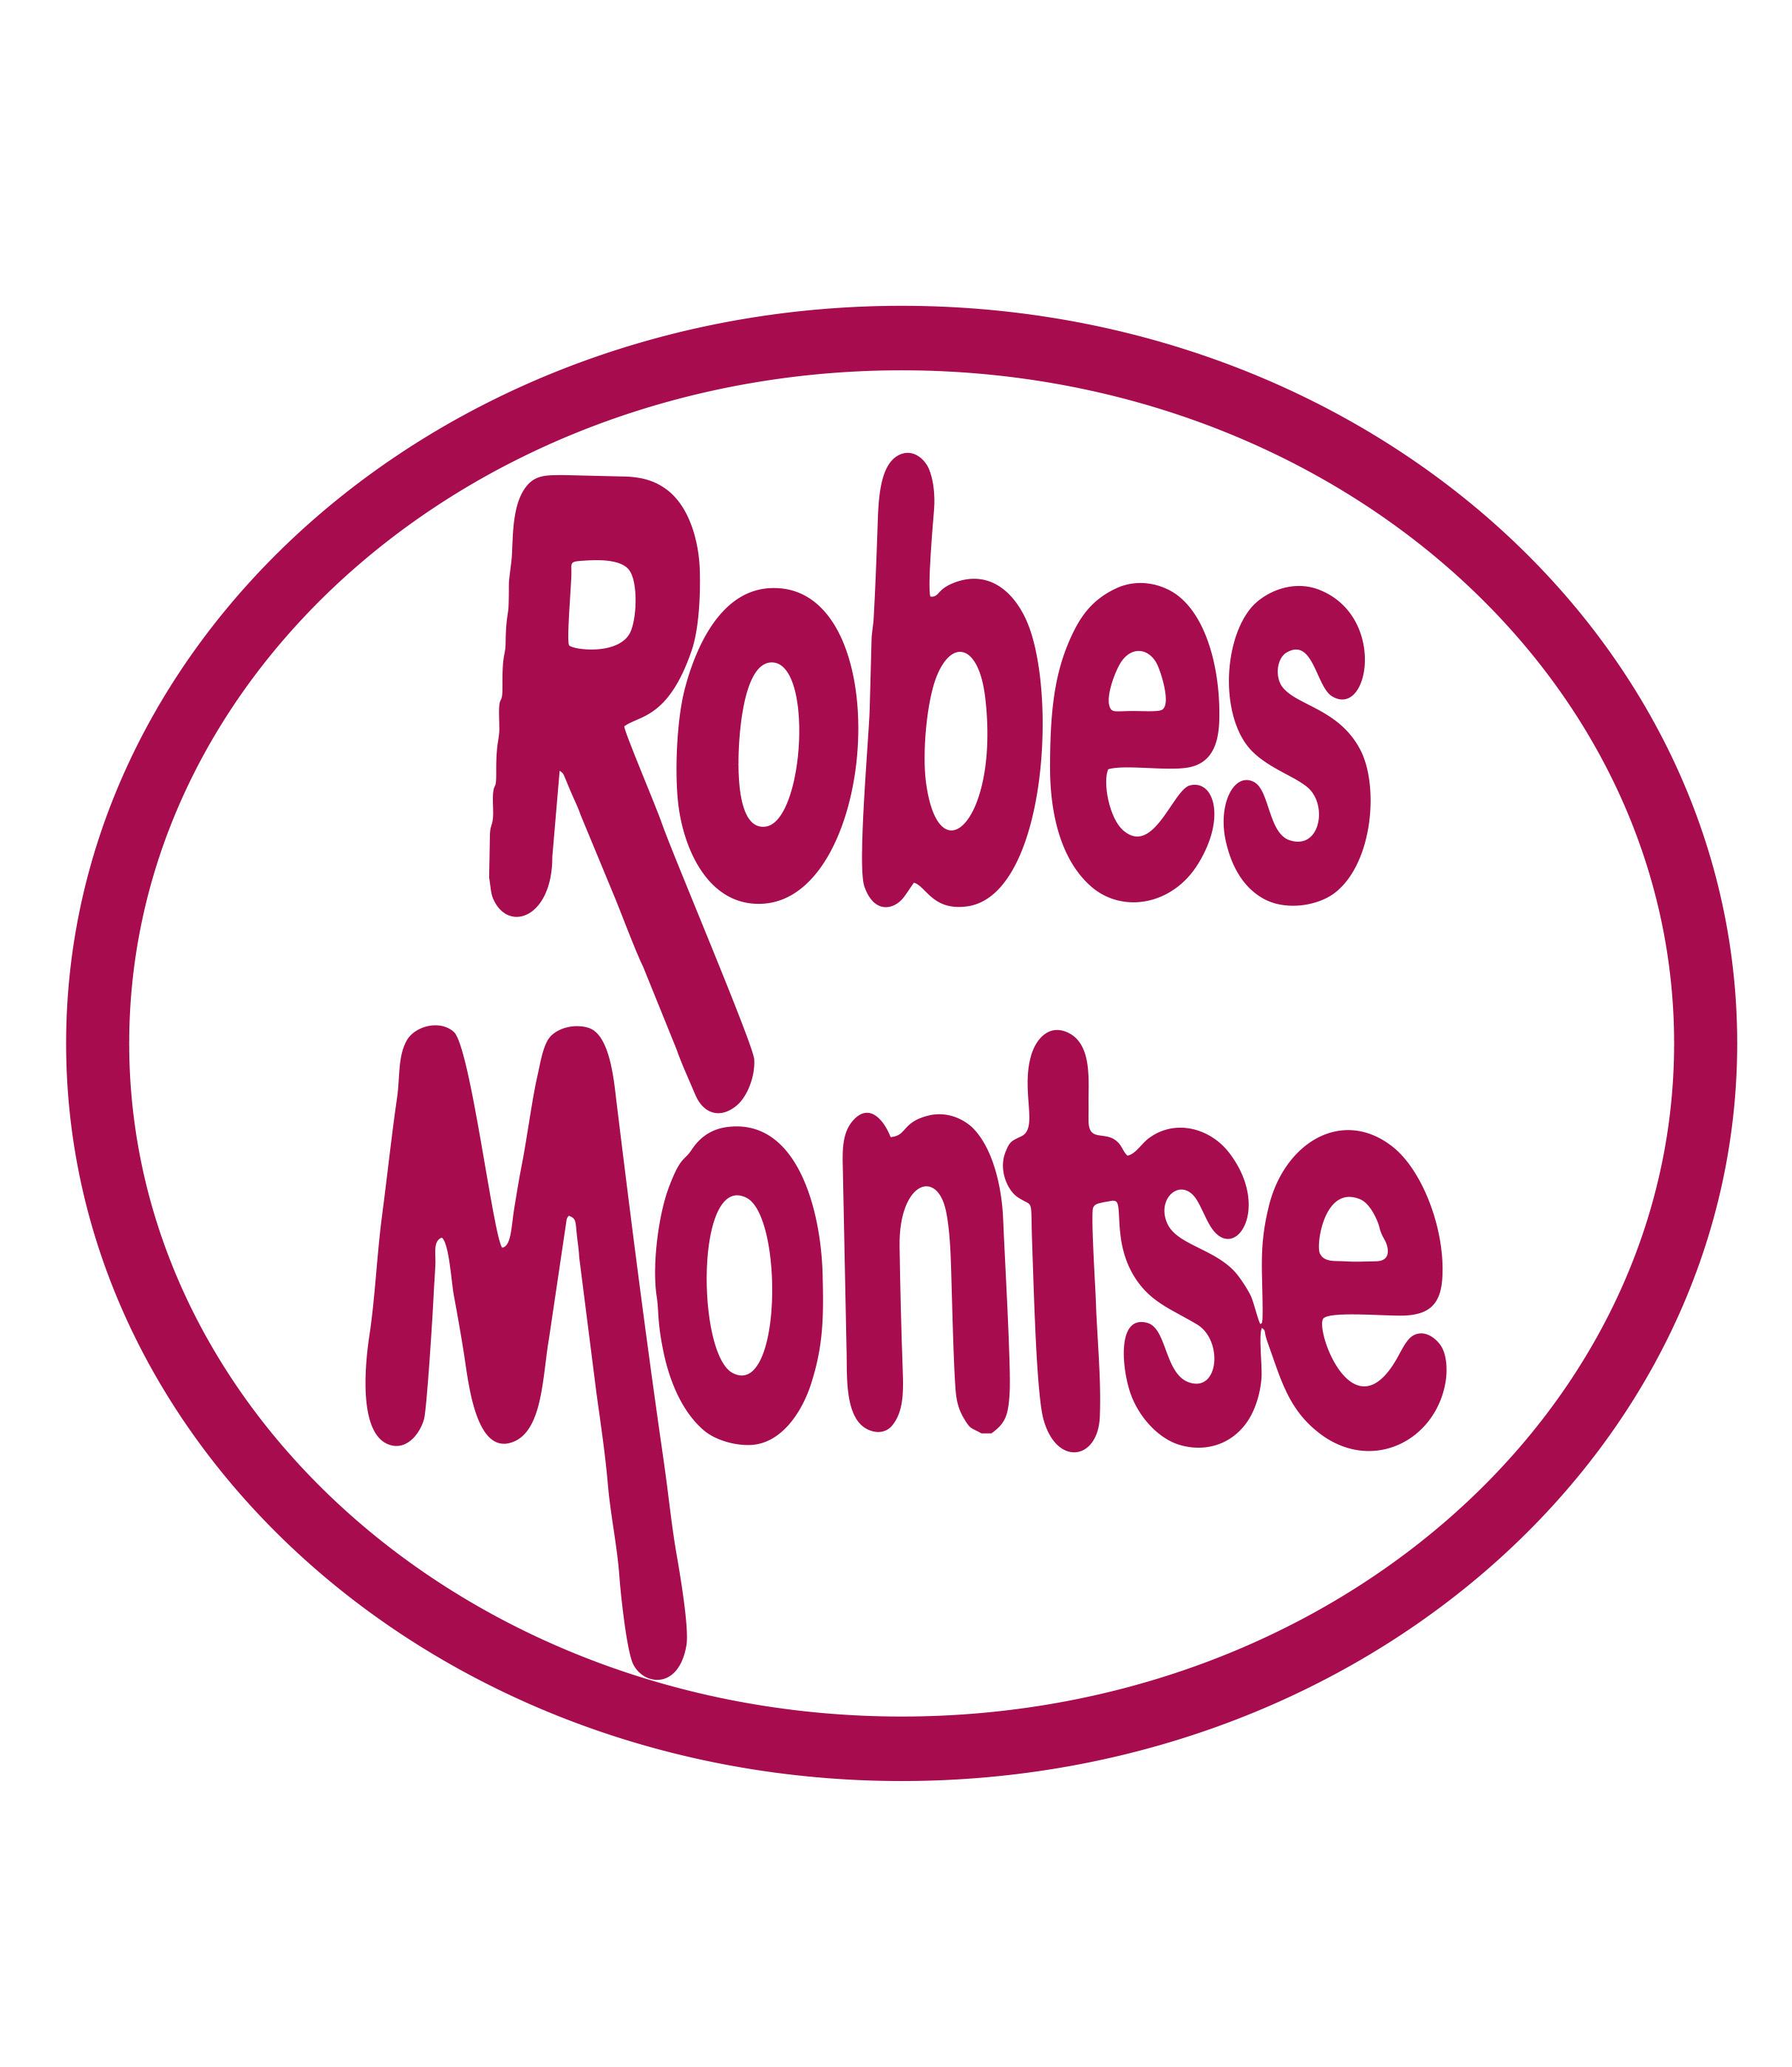 ROBES MONTSE